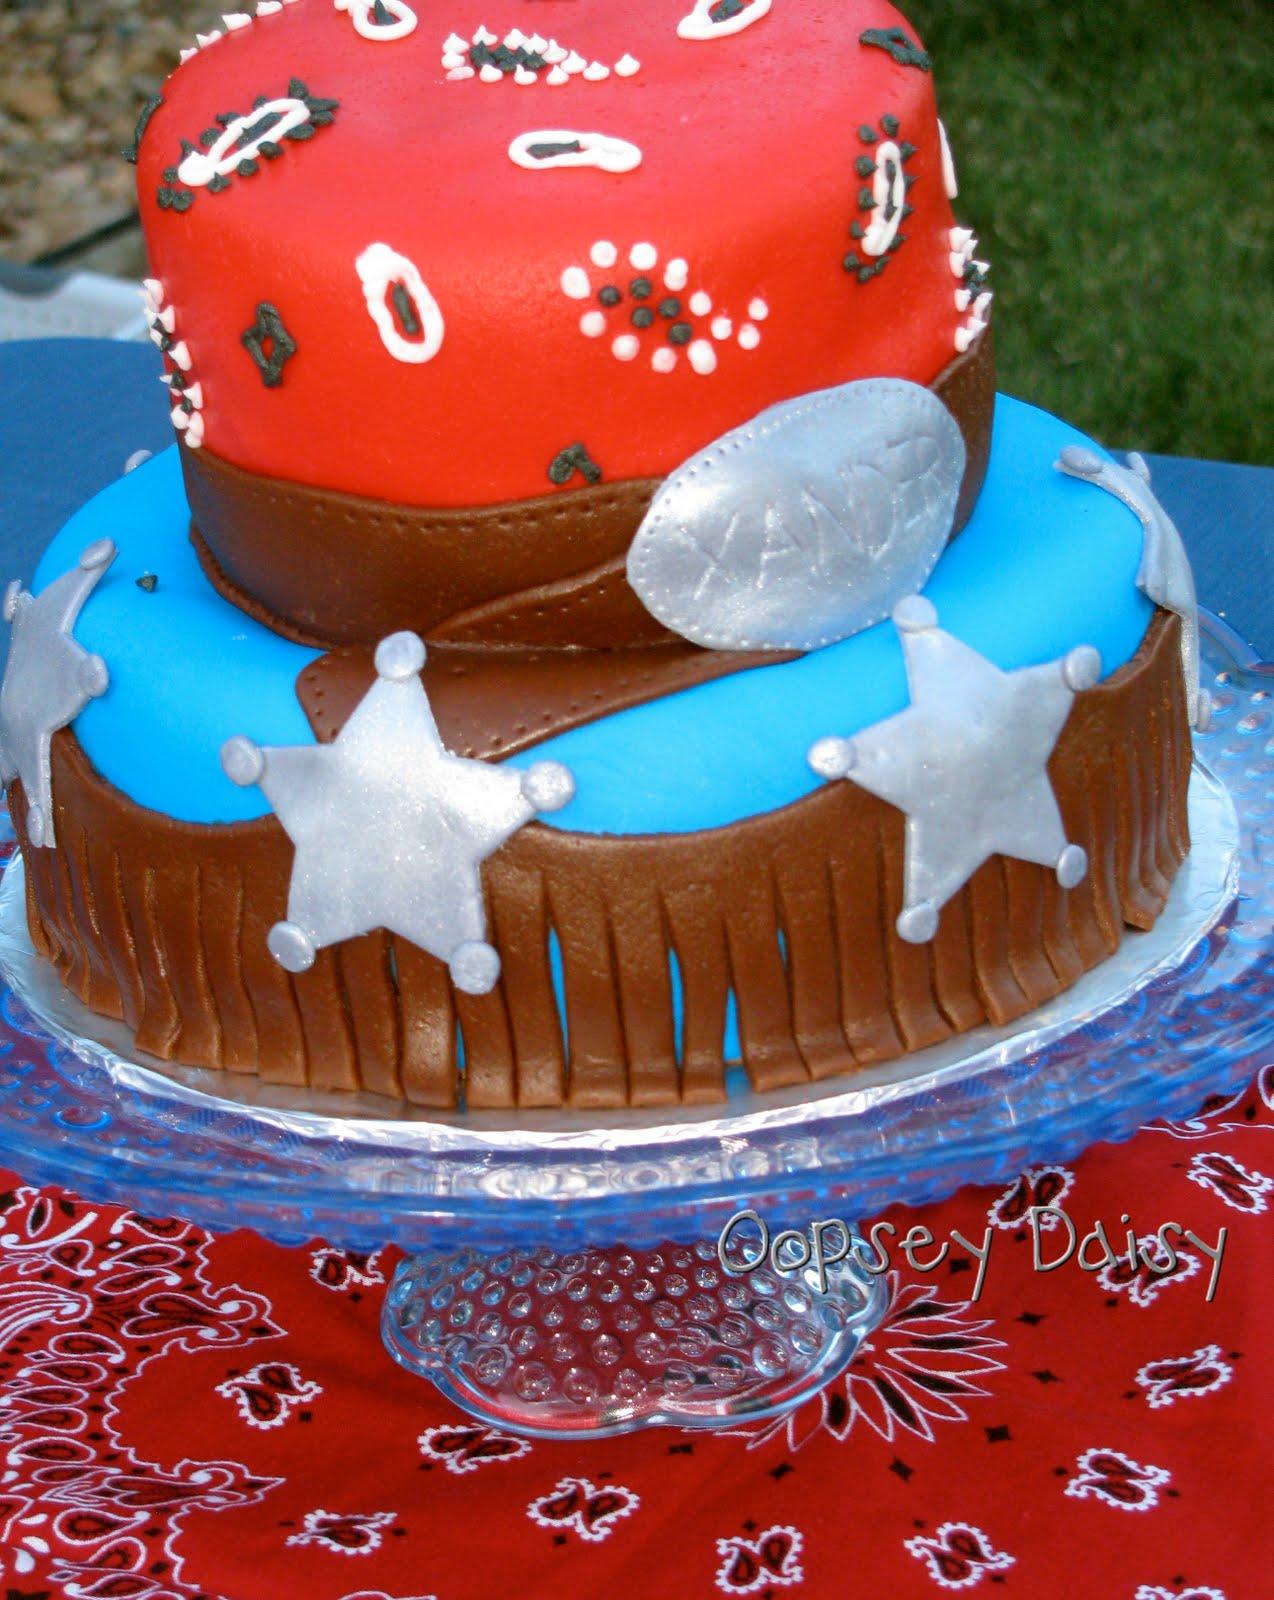 http://3.bp.blogspot.com/_EKdi4TALN1k/TEhXCizC6qI/AAAAAAAAHt0/IYQ89upEoOs/s1600/cowboy%20party_cake.jpg